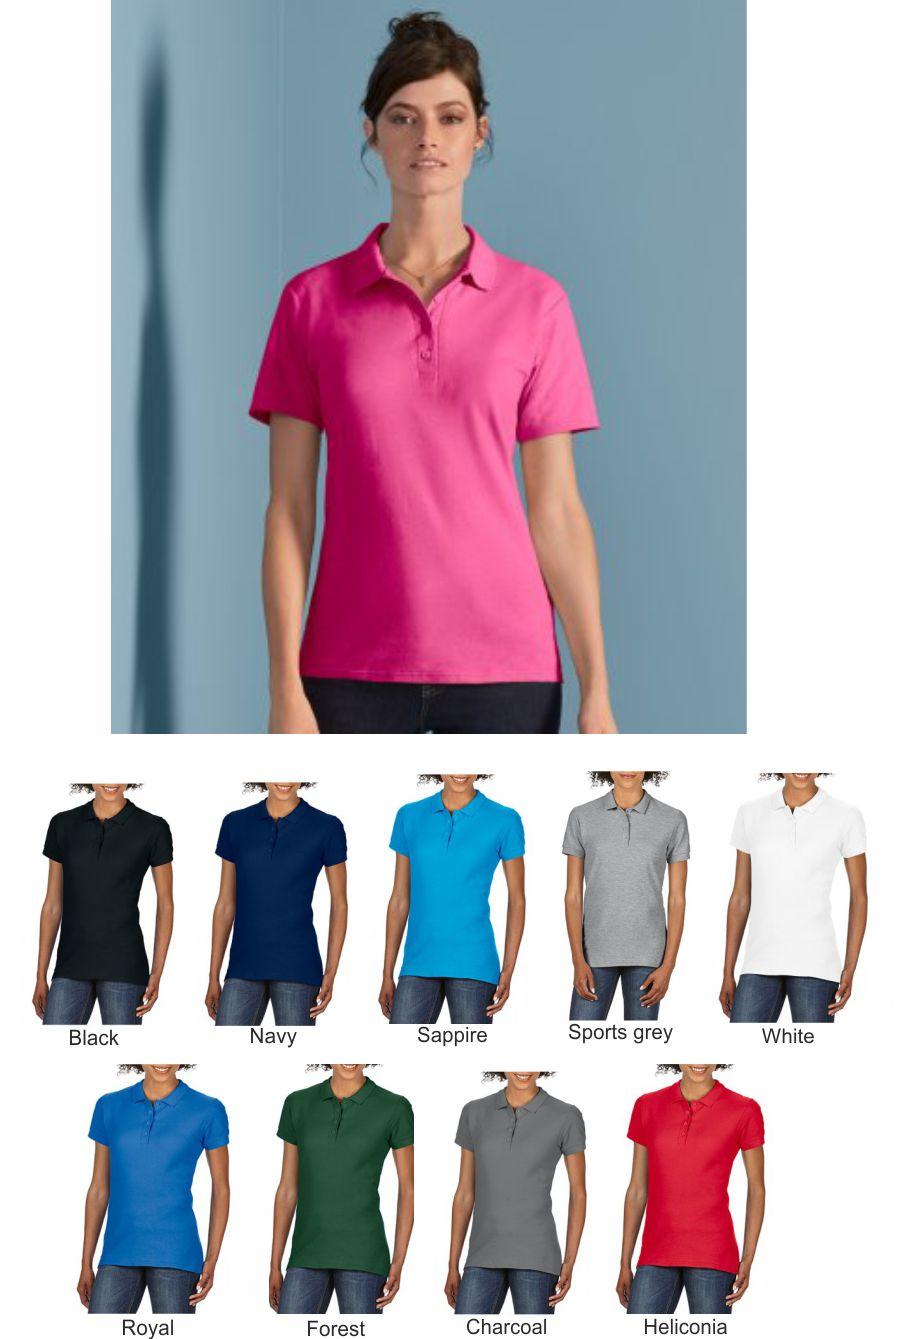 Kids Polo Shirts Boys /& Girls Gildan Jersey Knit Polo School Shirt GD44B